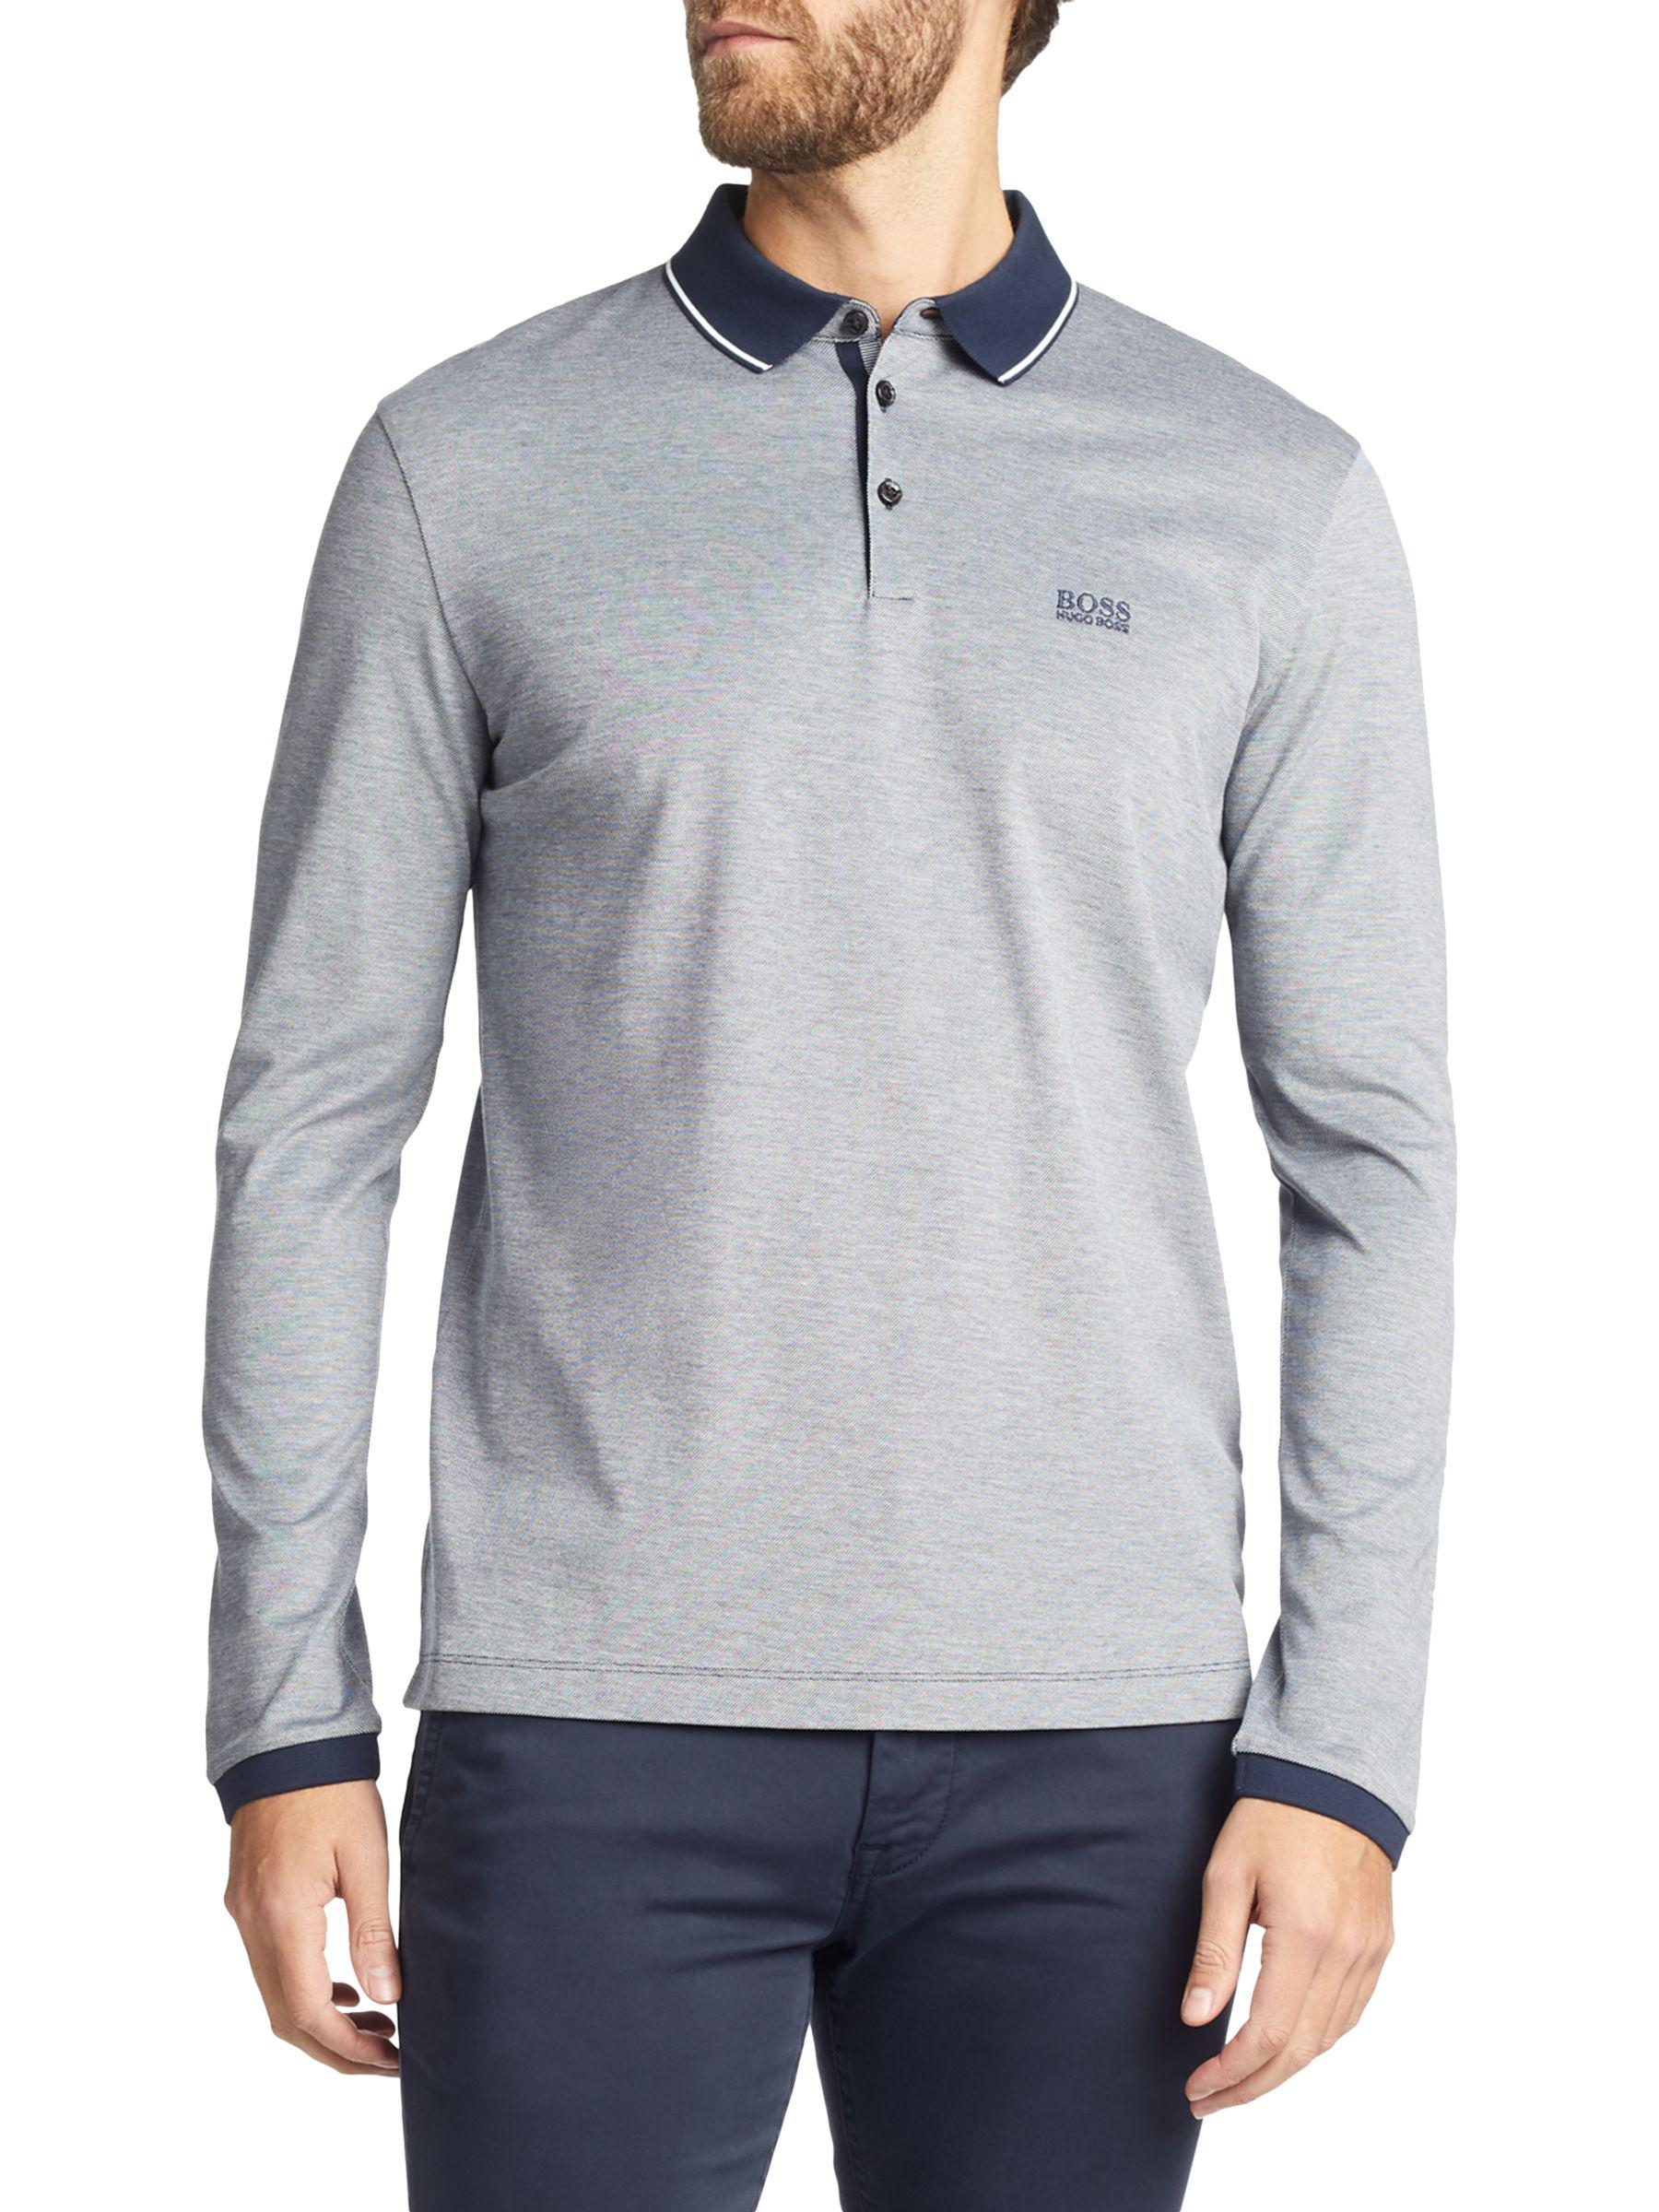 e2badc93 BOSS Boss Pearl Long Sleeve Polo Shirt in Blue for Men - Lyst